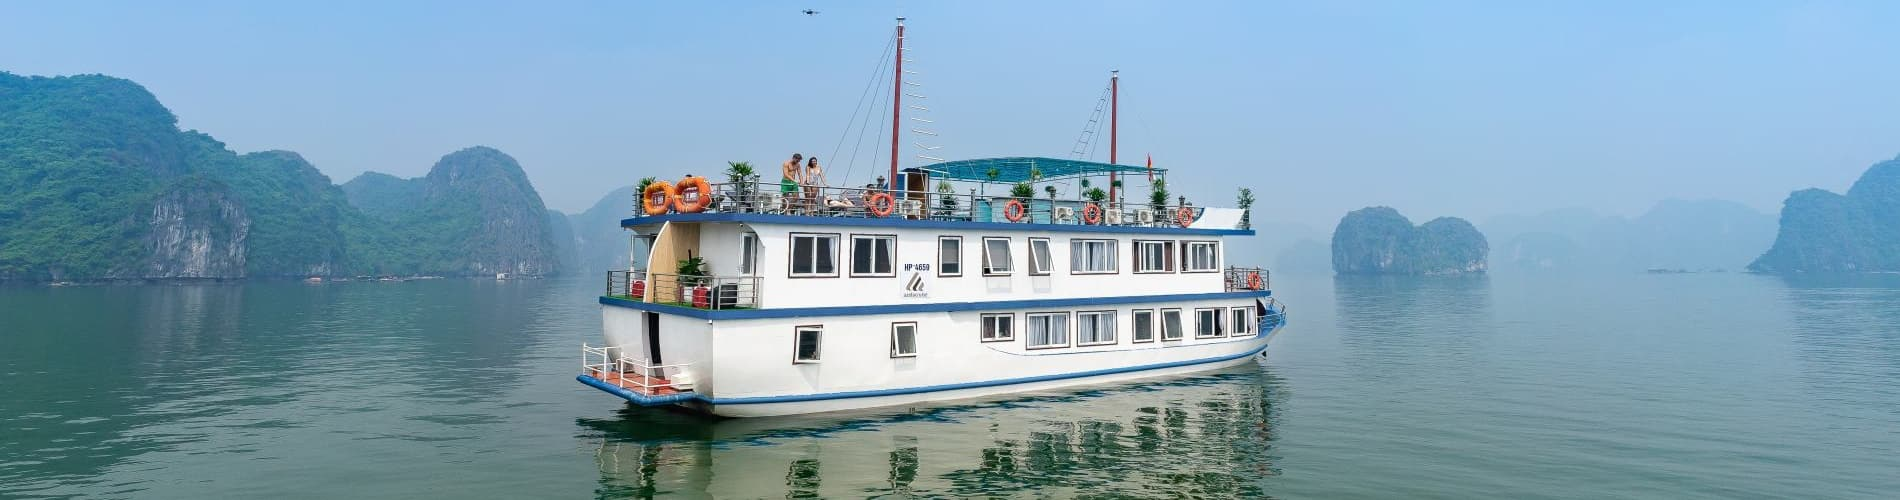 Azela Cruise